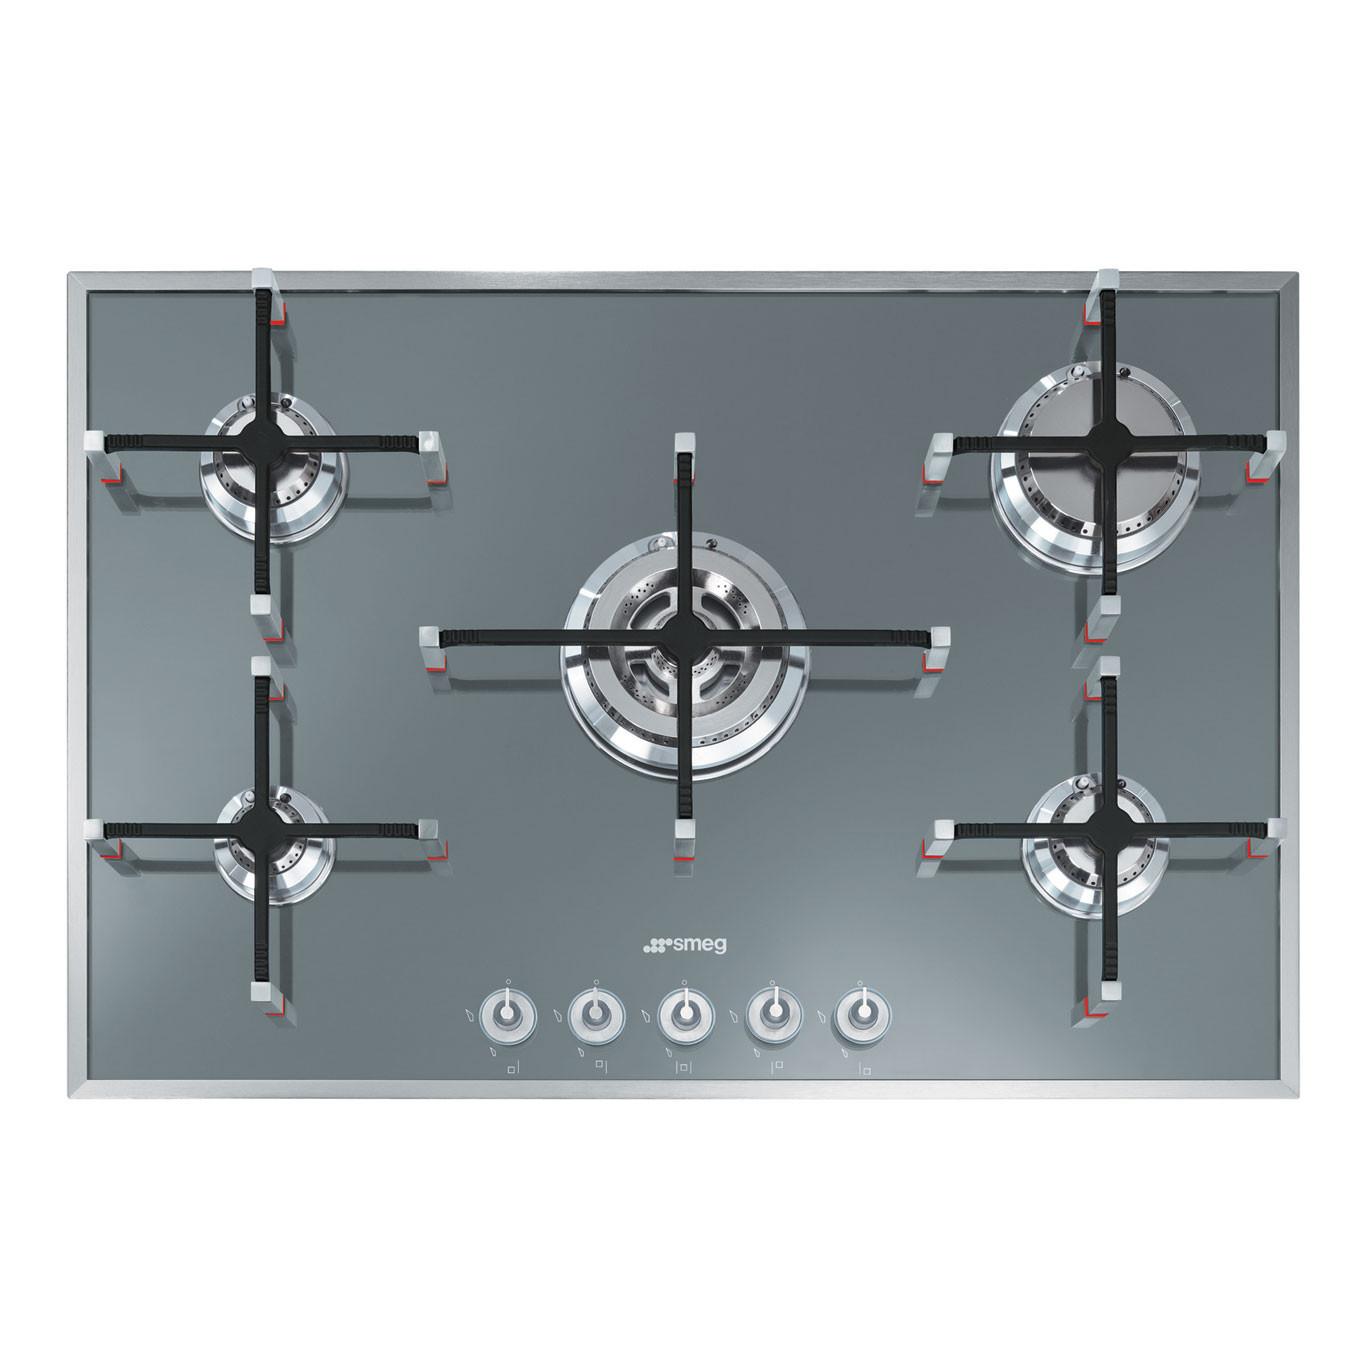 Buy Smeg PVS750 Linea 74cm Silver Gas Hob PVS750